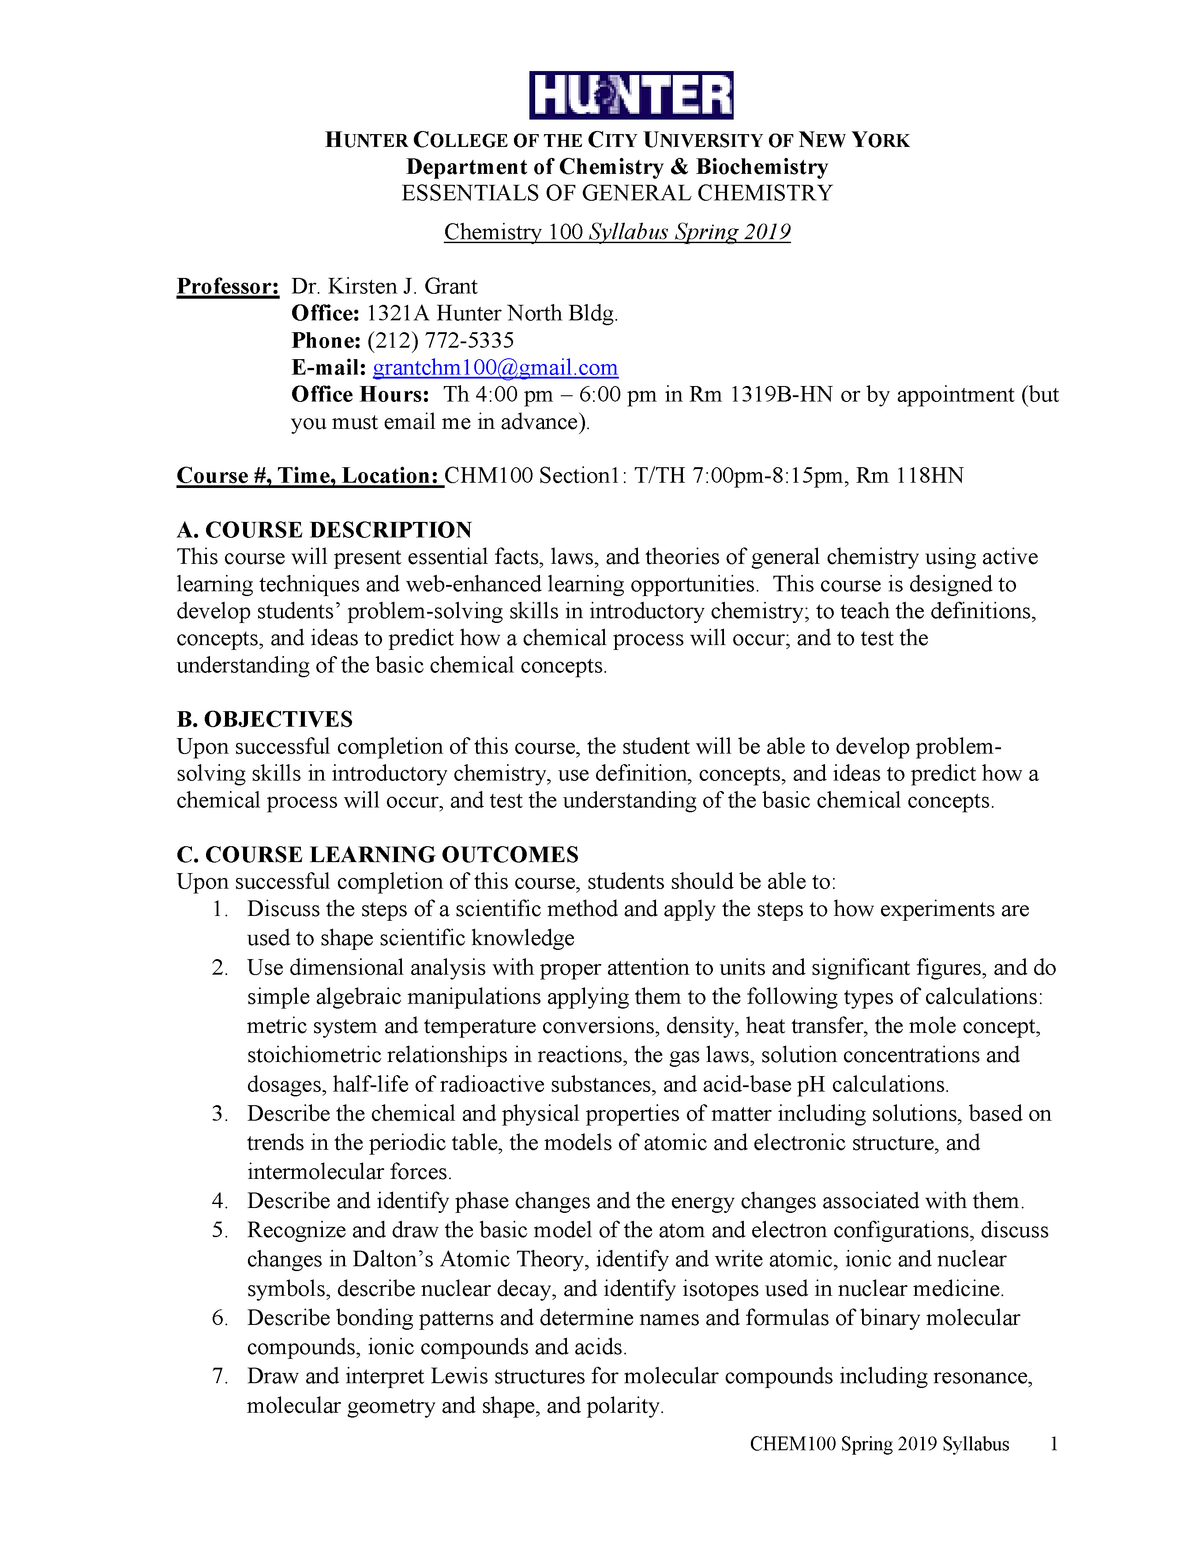 CHEM 100 00 - Essentials of General Chemistry (SP19) - CHEM